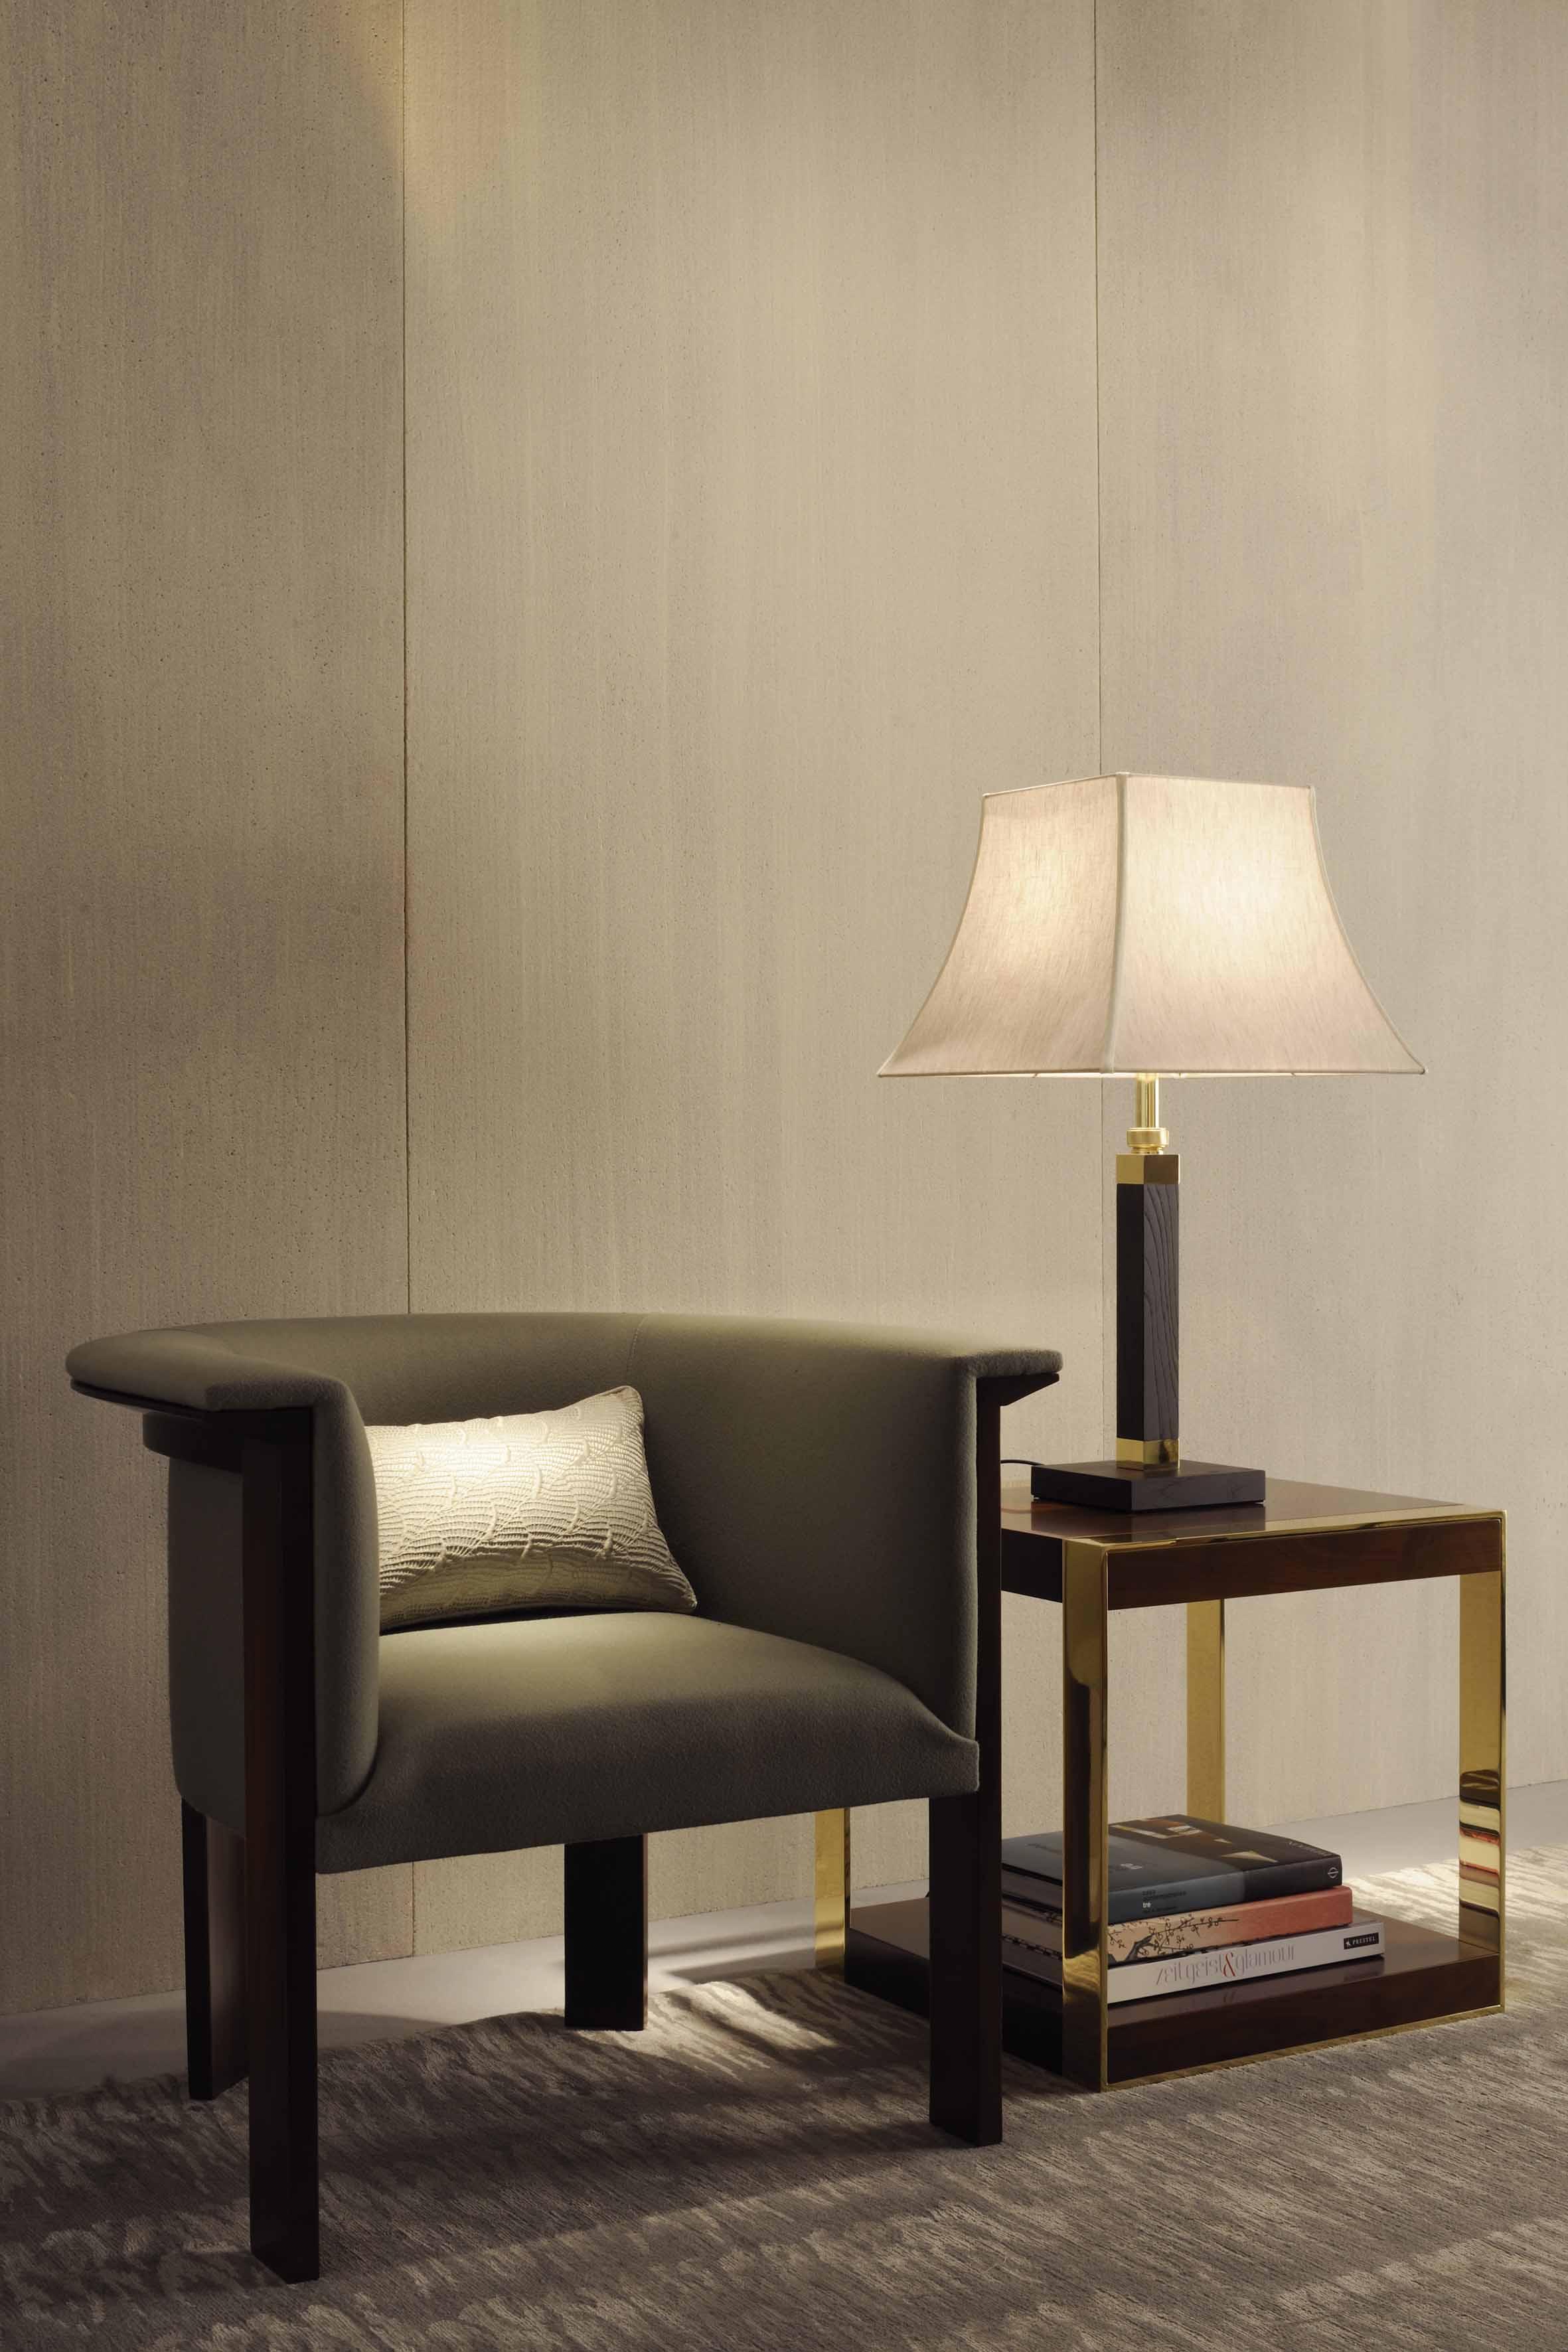 Muebles lujo hogar 20170914220719 for Marcas de muebles